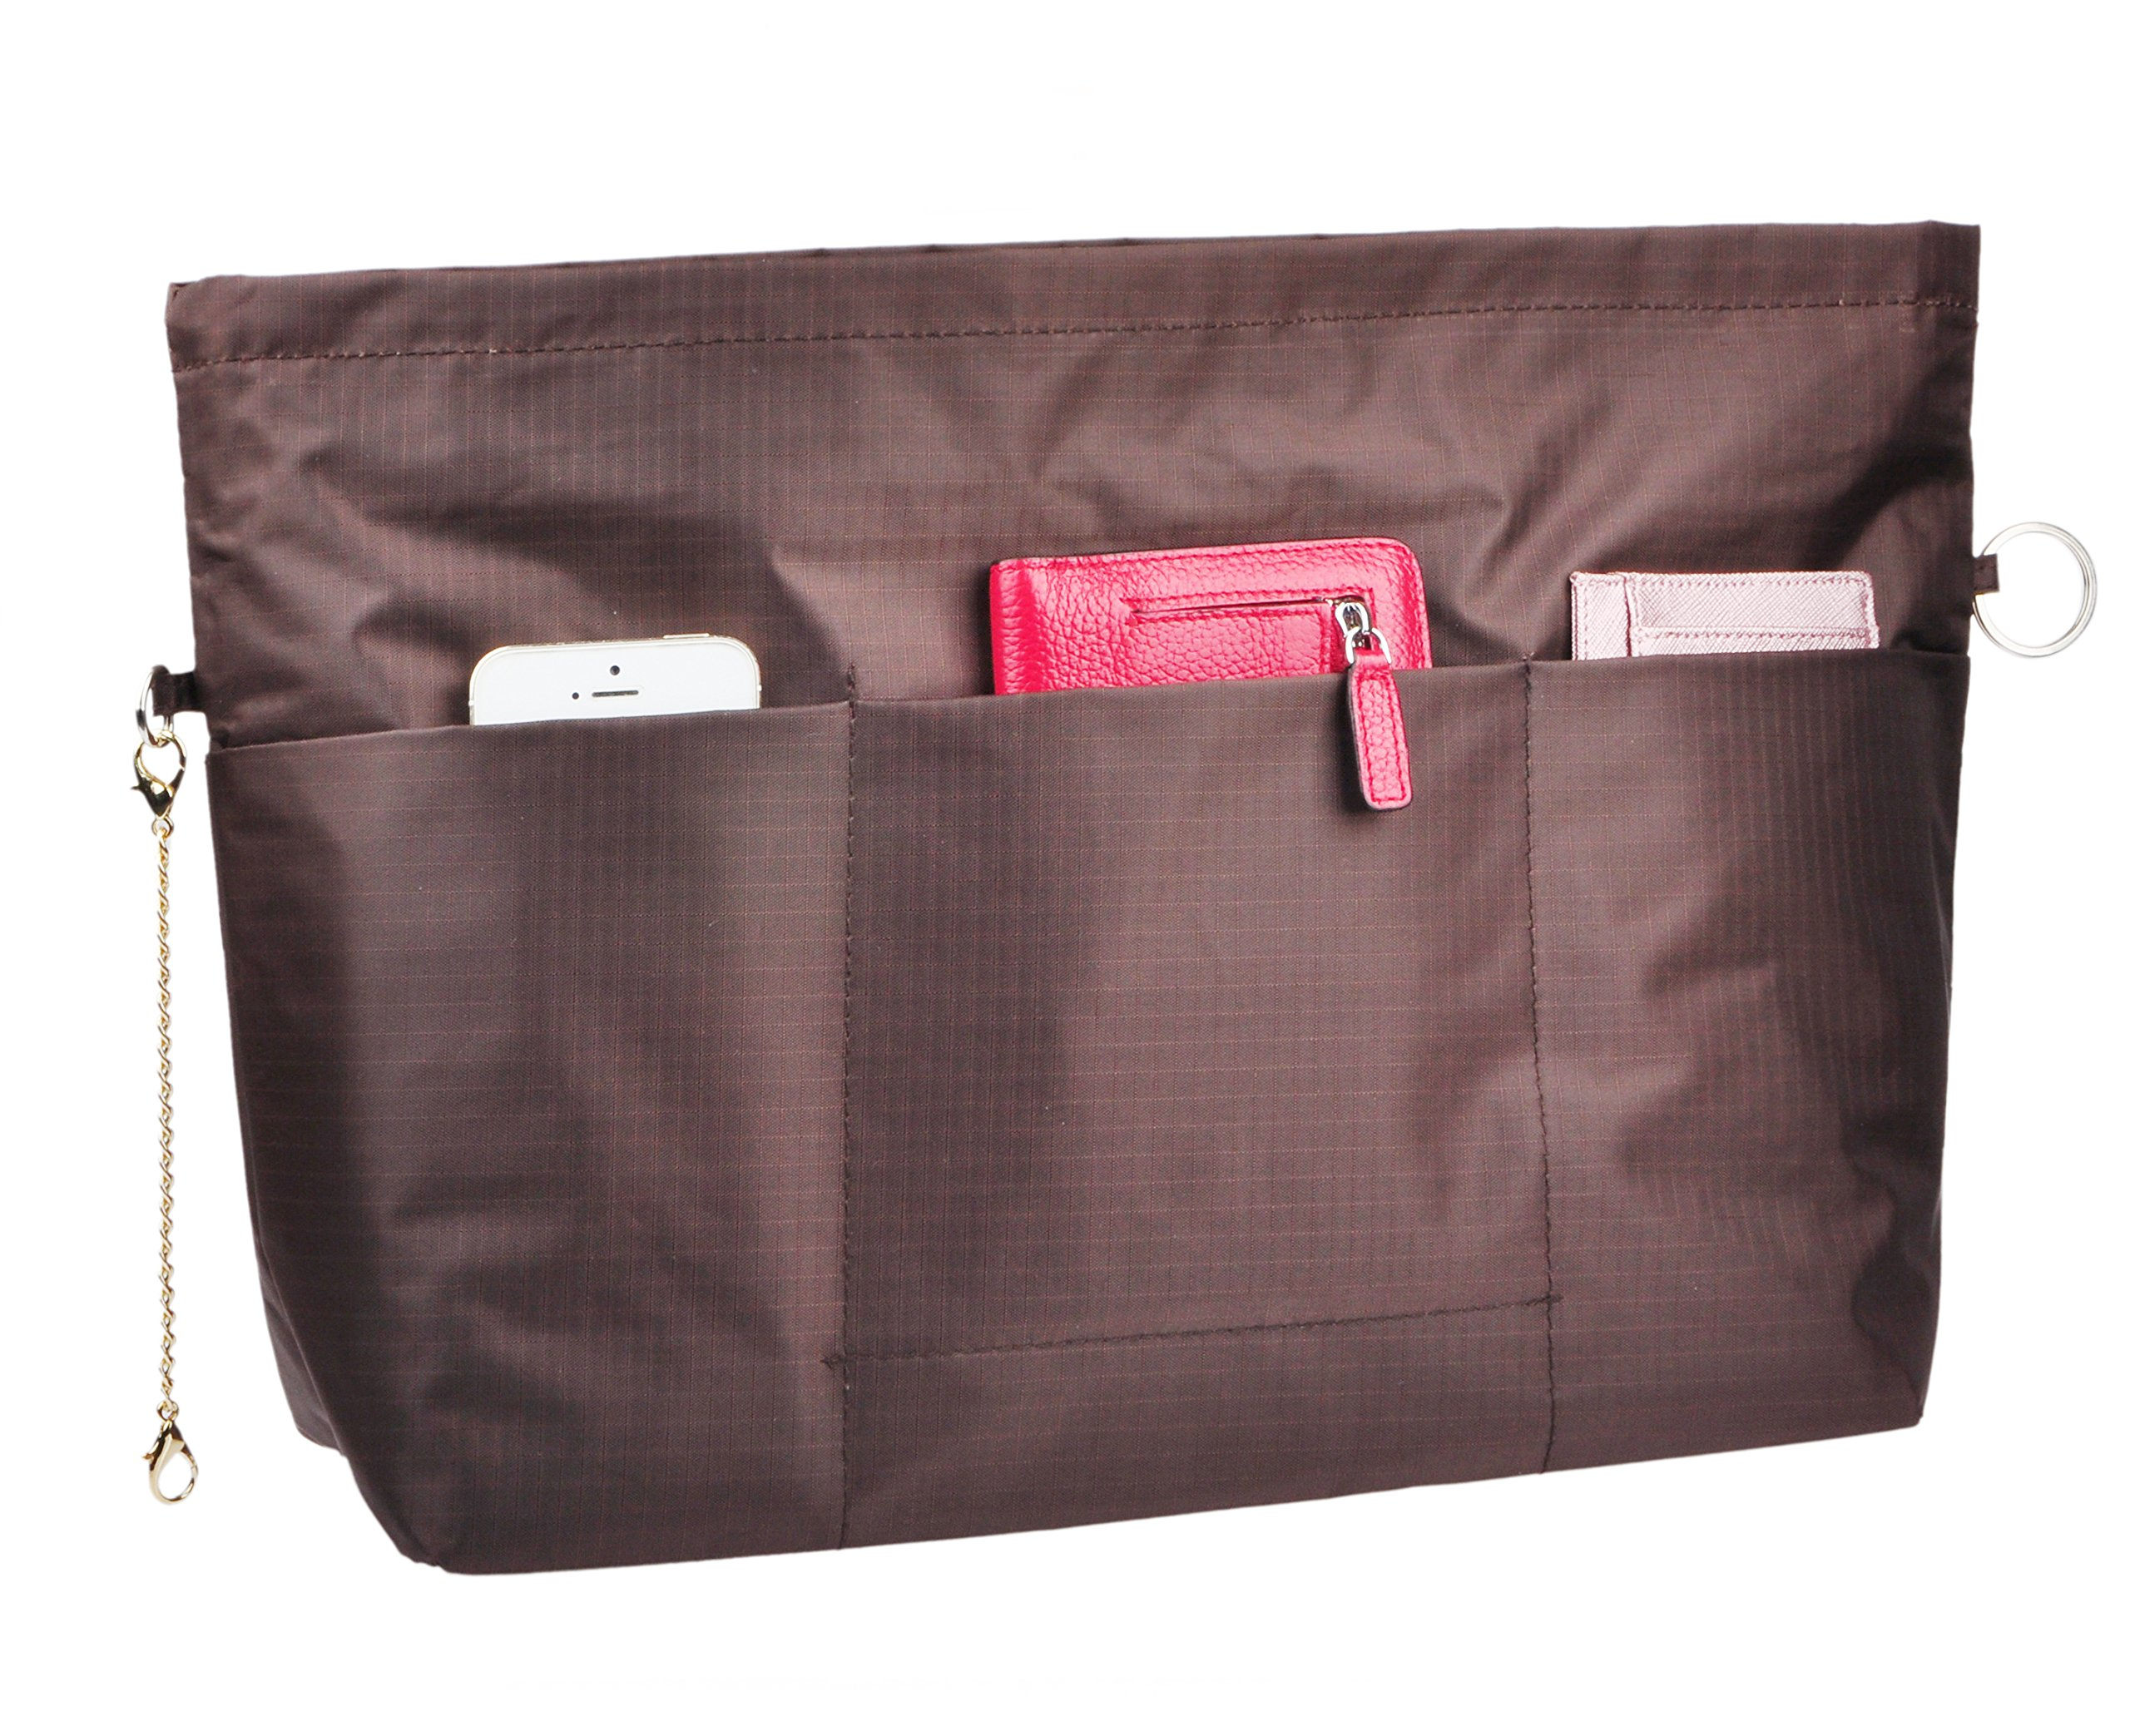 Vercord Handbag Purse Bag Insert Organizers Extra Thick Large Travel Handbag Organizer, Coffee